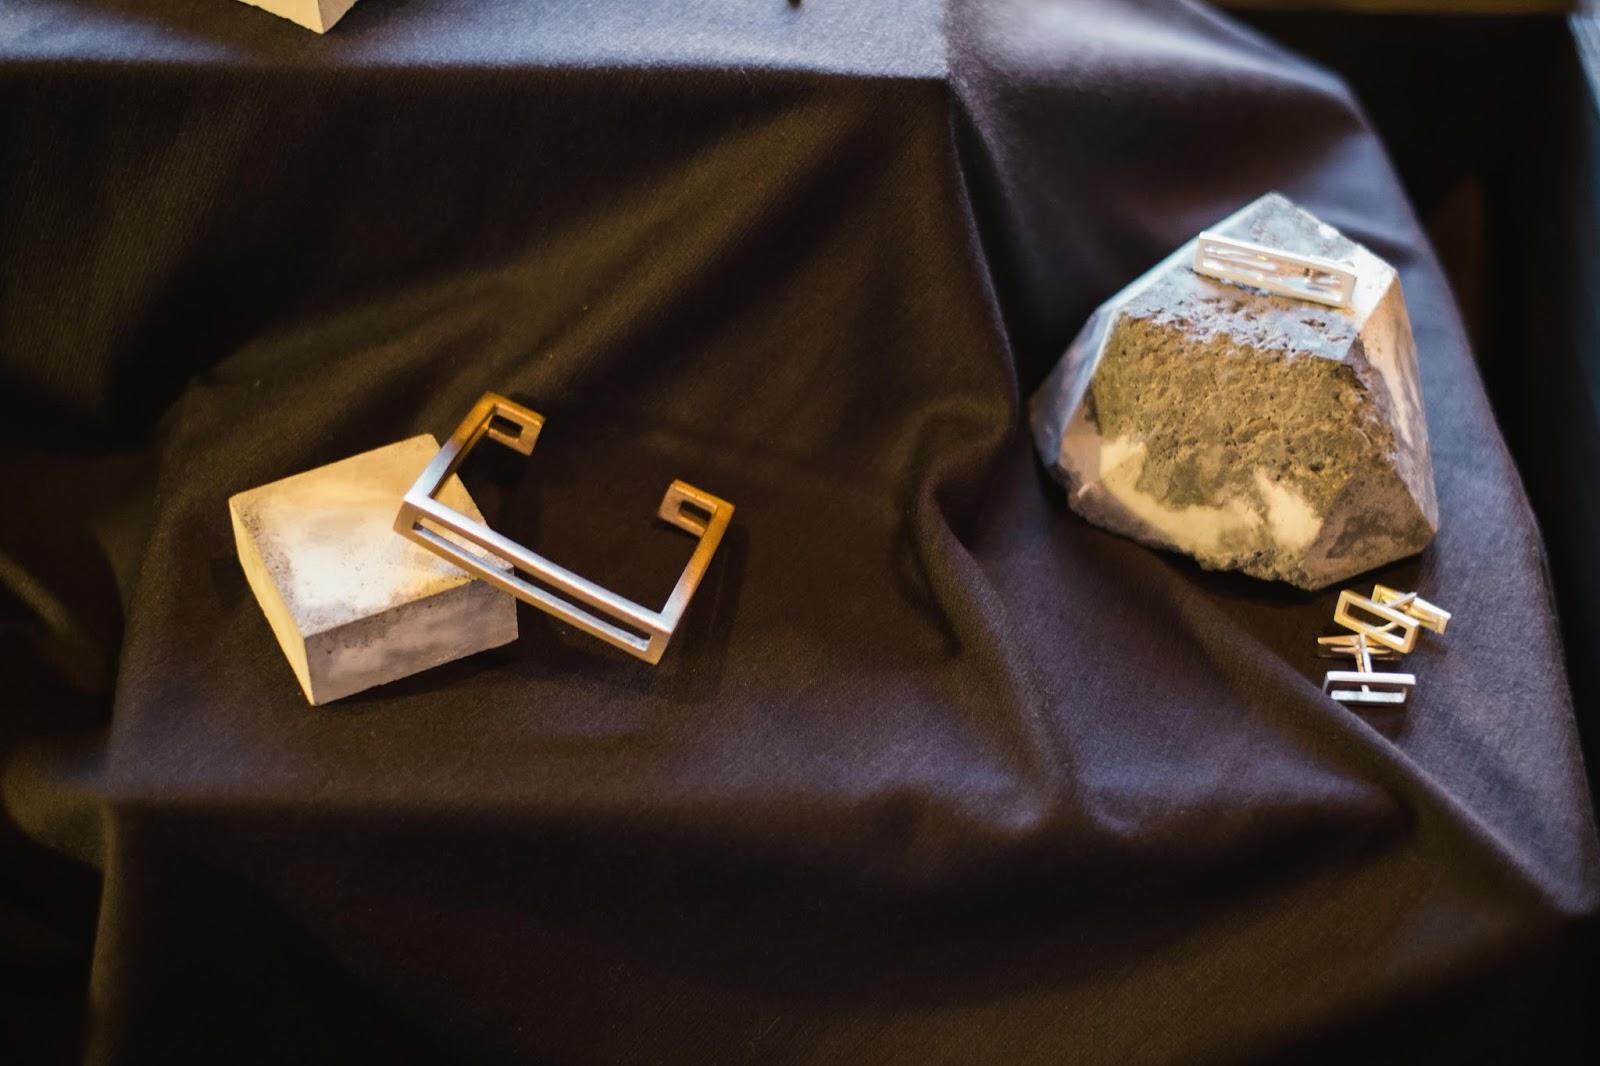 LZZR-%2Bmybelonging-lzzr-jewelry-losangeles-designer-dtla-acehotel-9.jpg